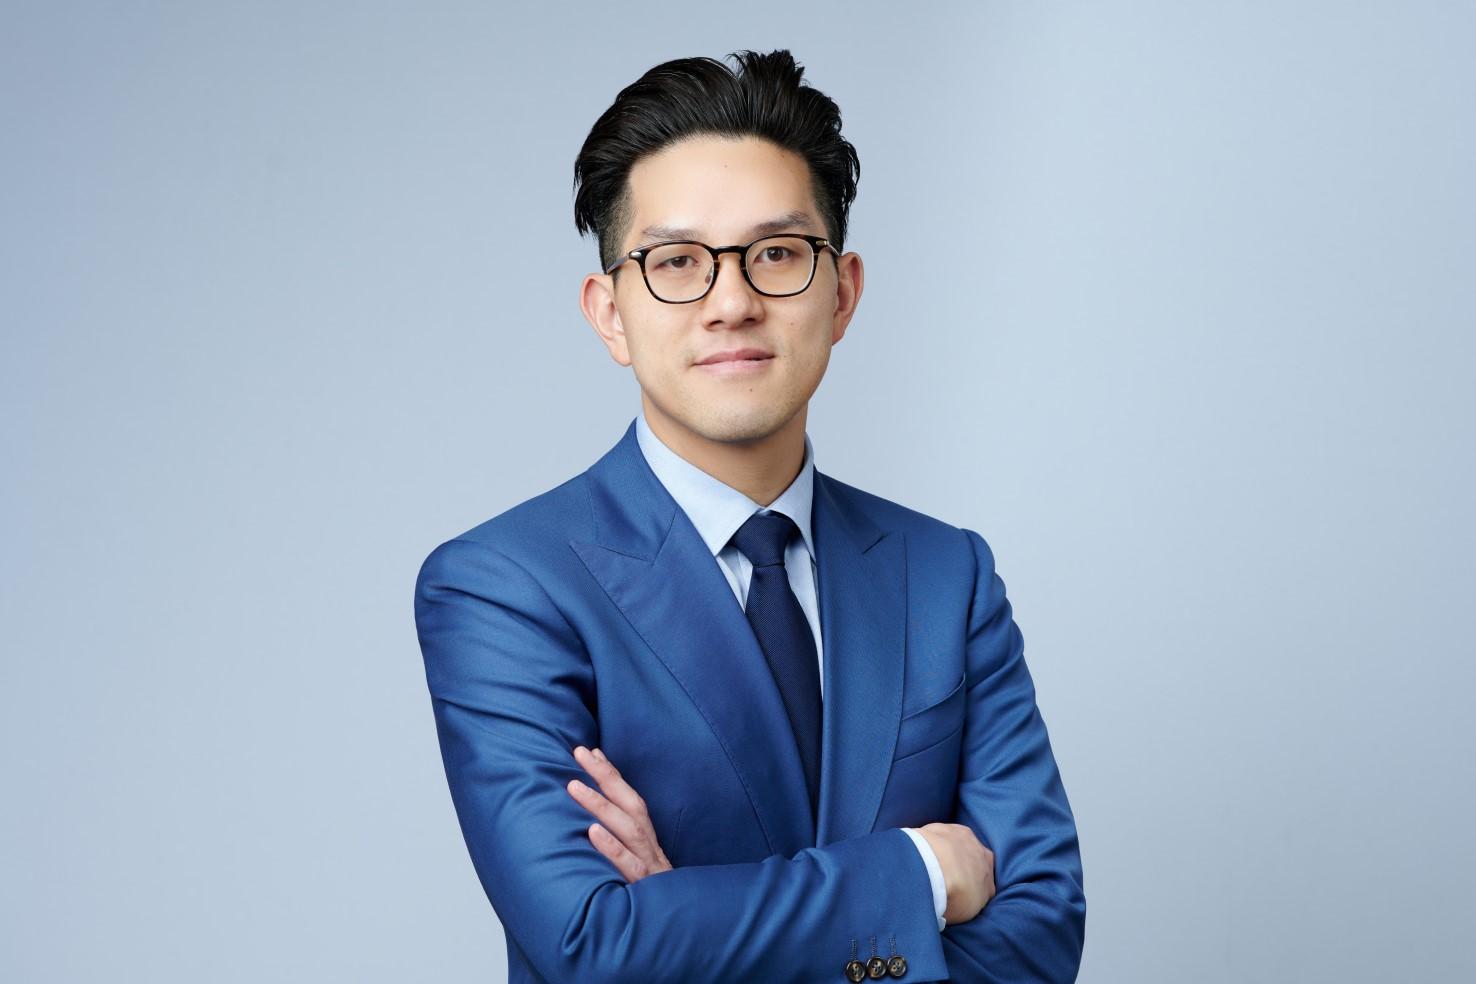 LUK Ngai Hong, Vincent profile image